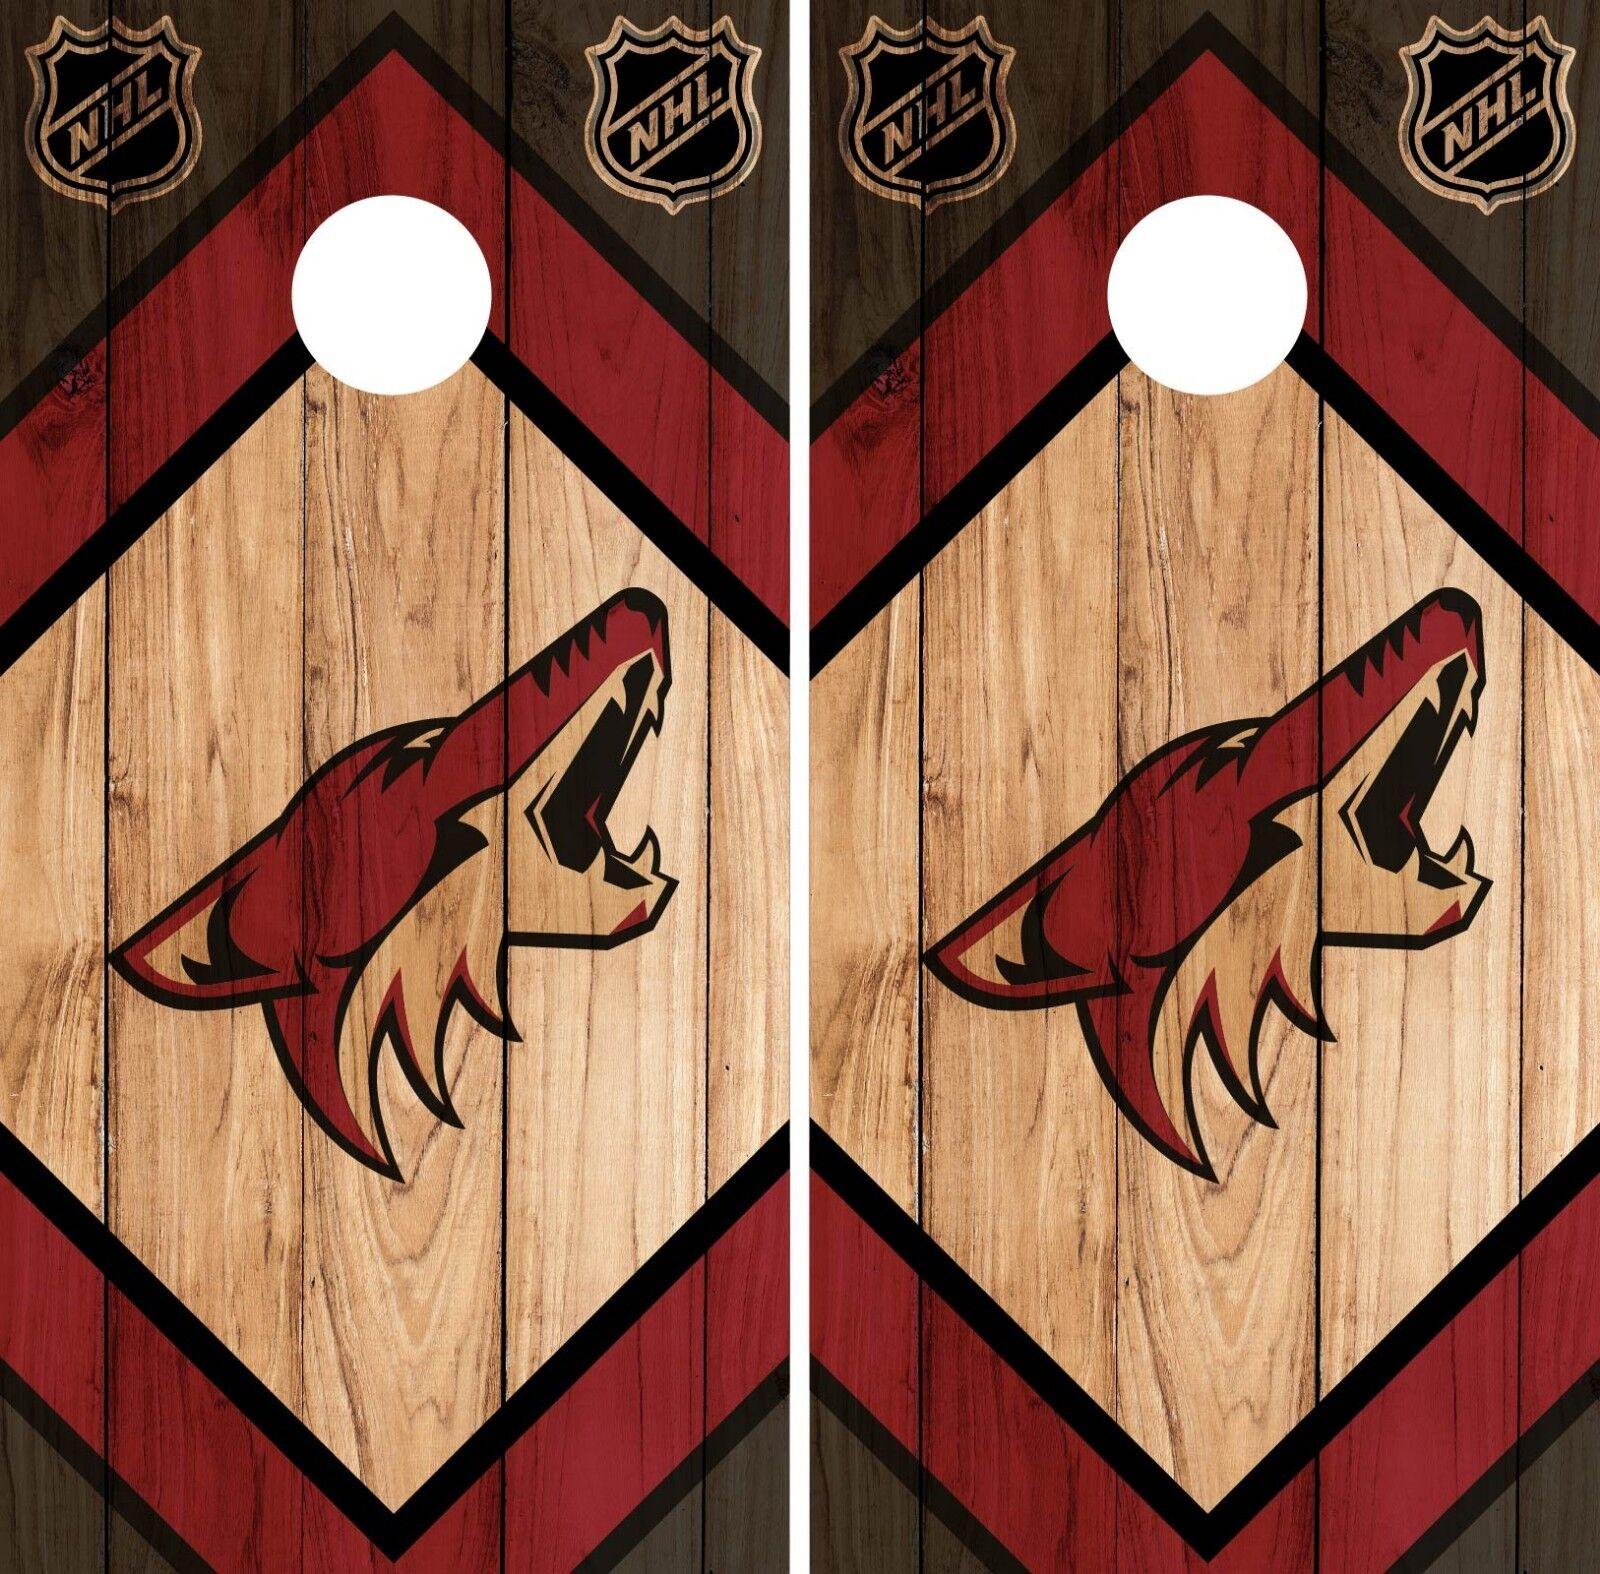 Arizona Coyote Cornhole Wrap NHL  Game Board Skin Set Vinyl Decal CO178  no tax